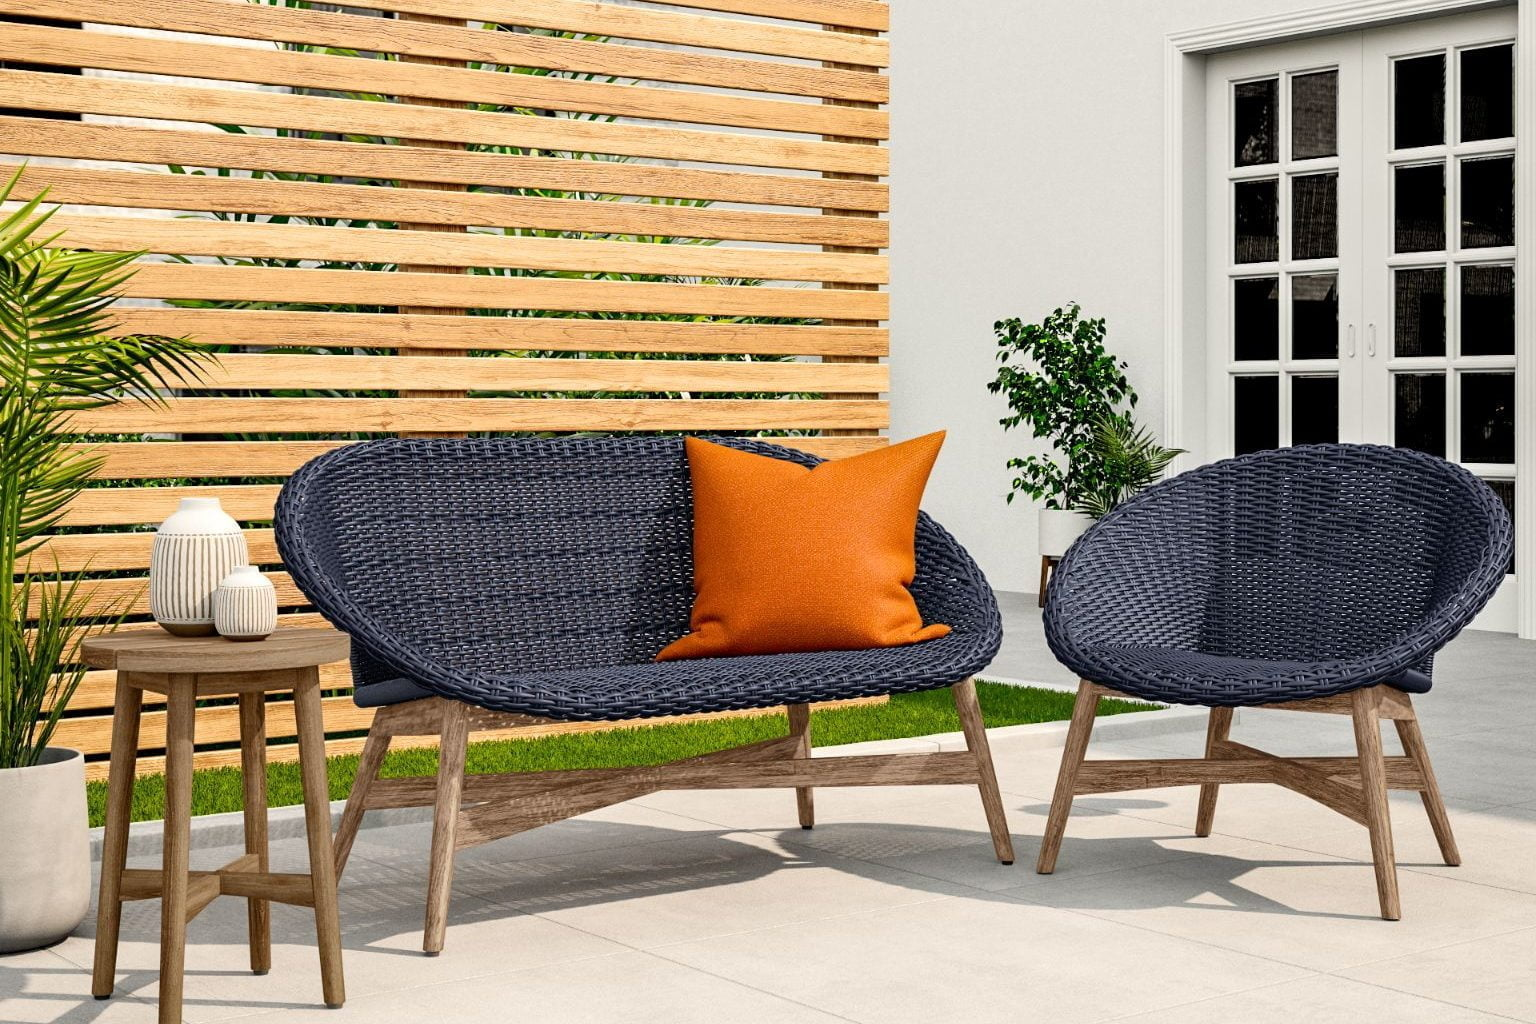 New Garden Furniture for 10 / Outdoor Furniture